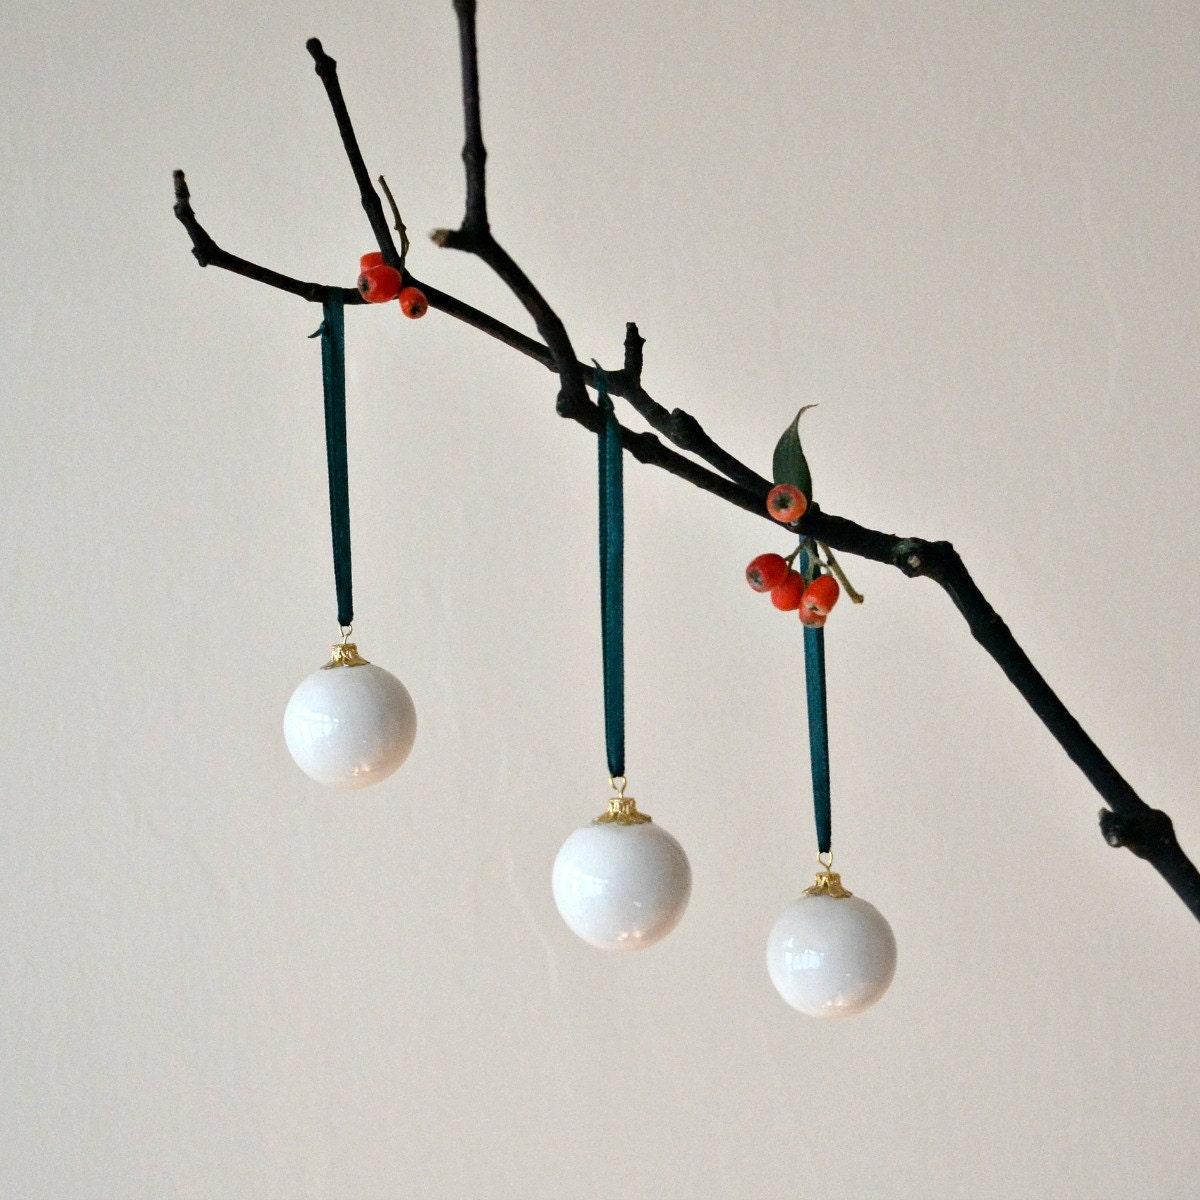 Christmas tree ornament, Christmas decoration, Christmas ball bowl, ceramic Christmas decoration ornament white snow - JasminBlancBoutique